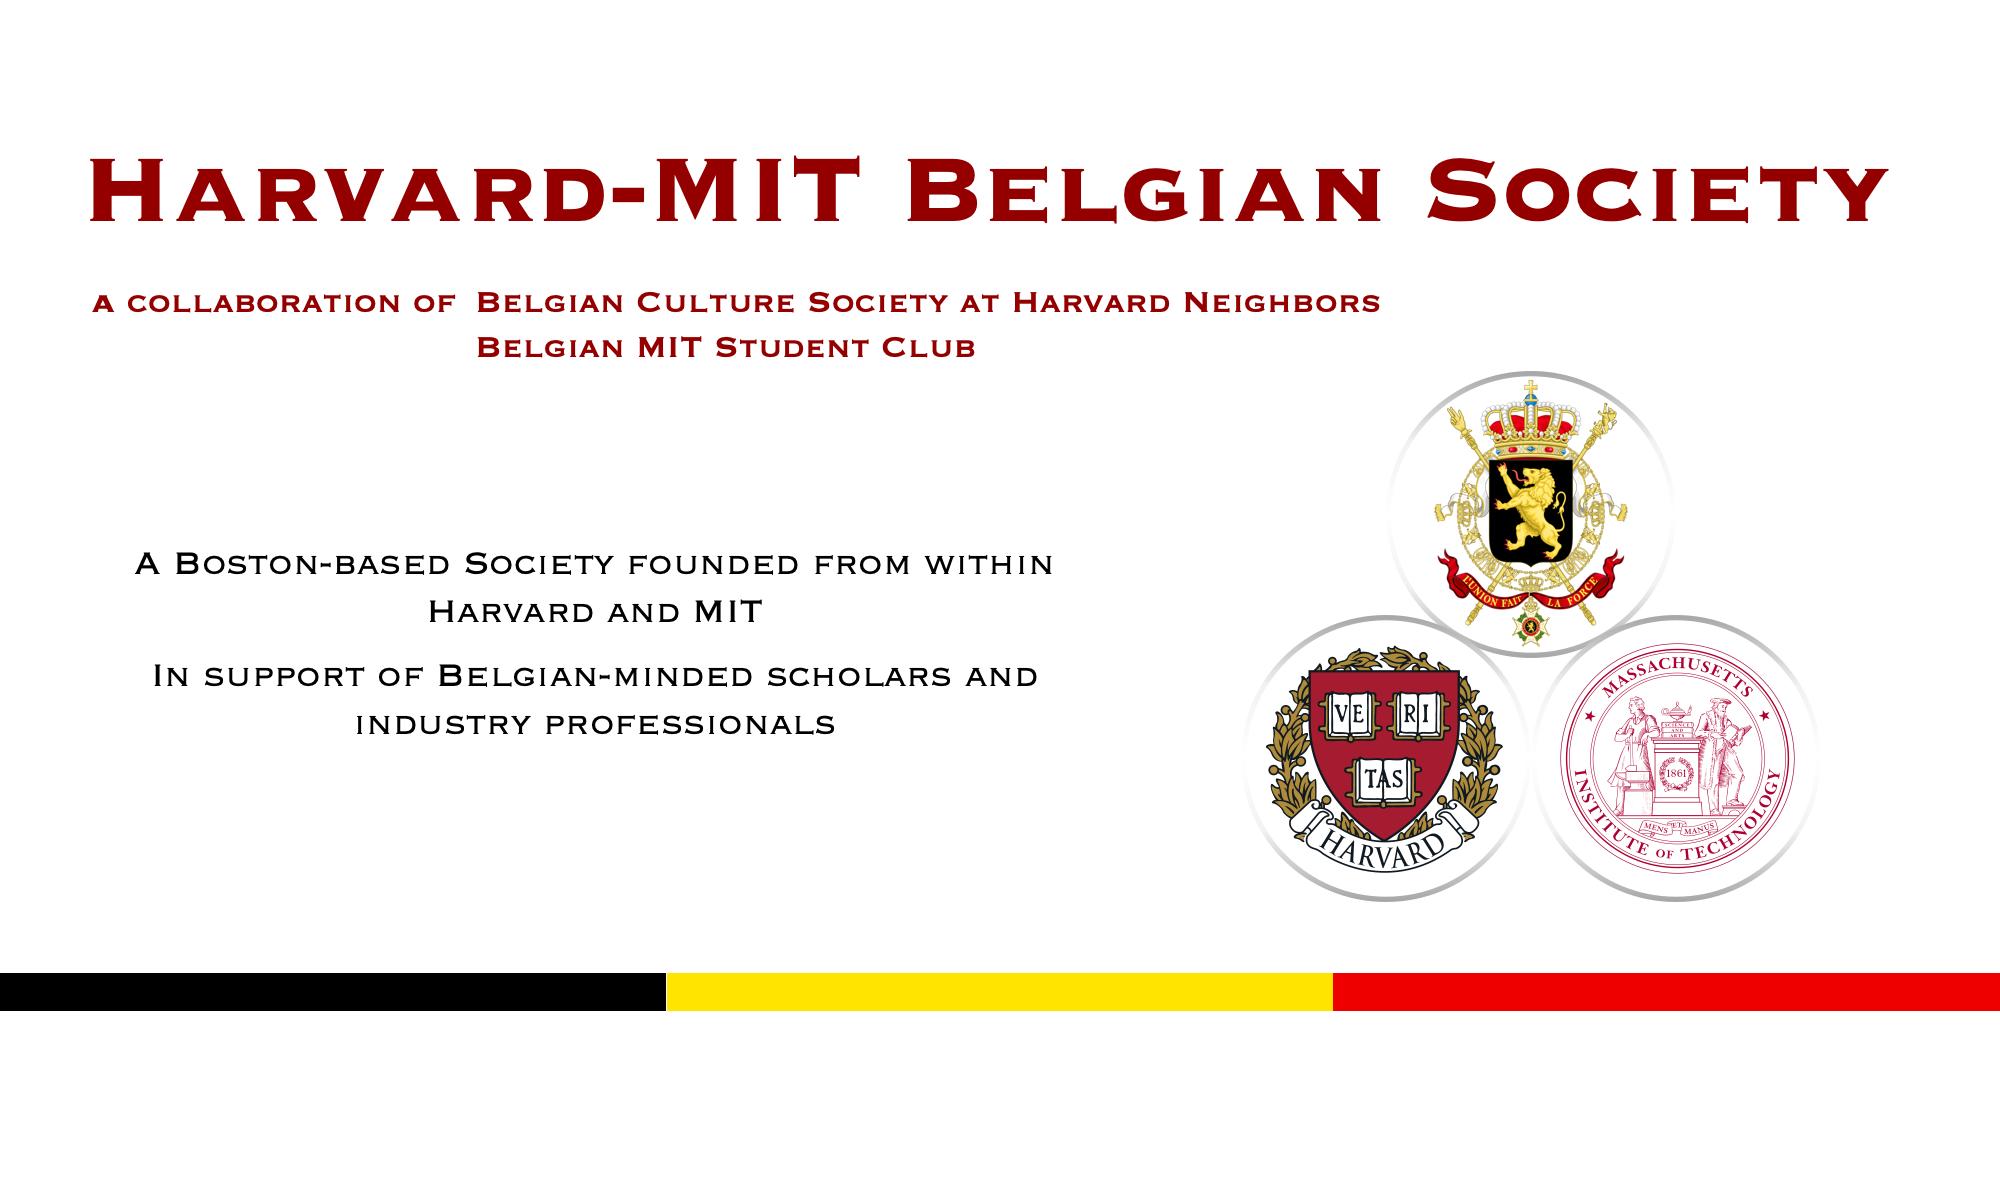 Harvard-MIT Belgian Society